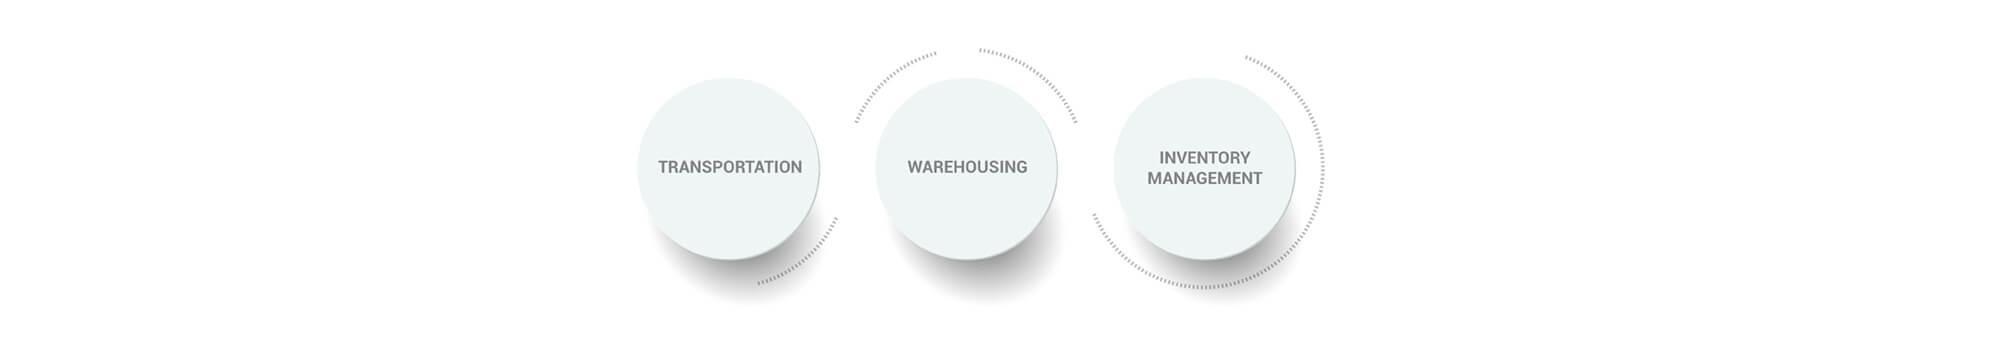 Transportation Warehousing Inventory Management Graphic